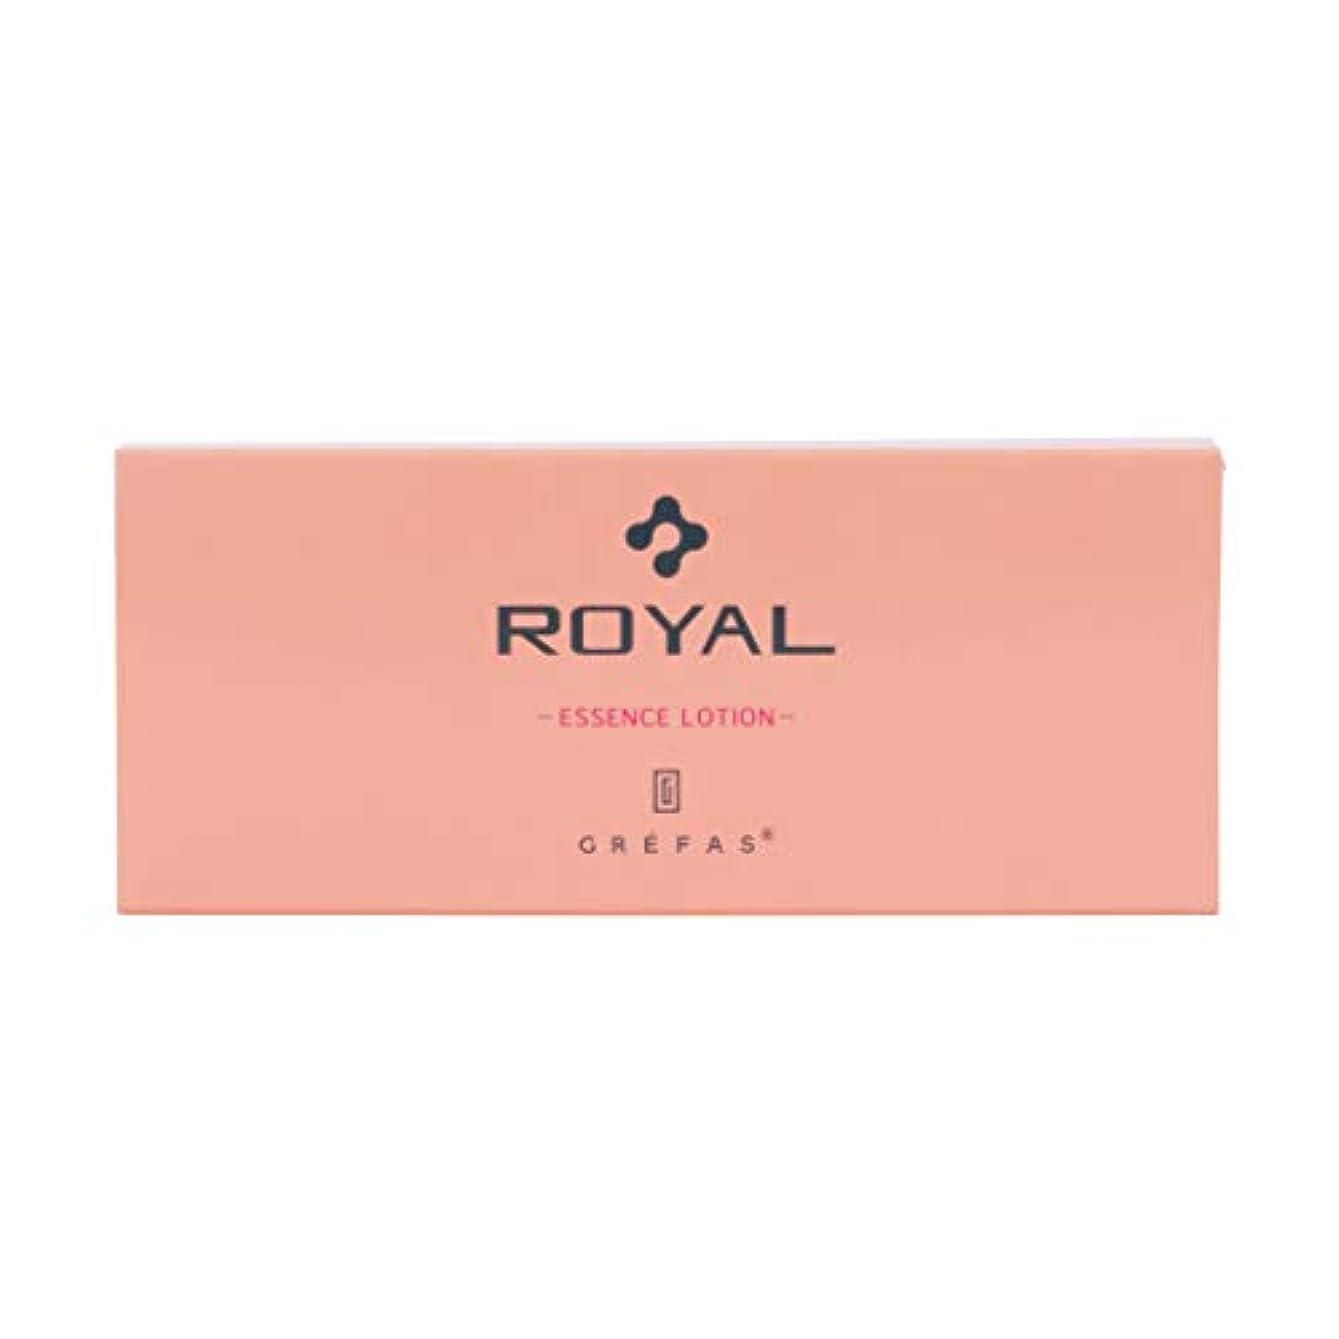 GREFAS ROYAL エッセンスローション 1.3ml×10袋